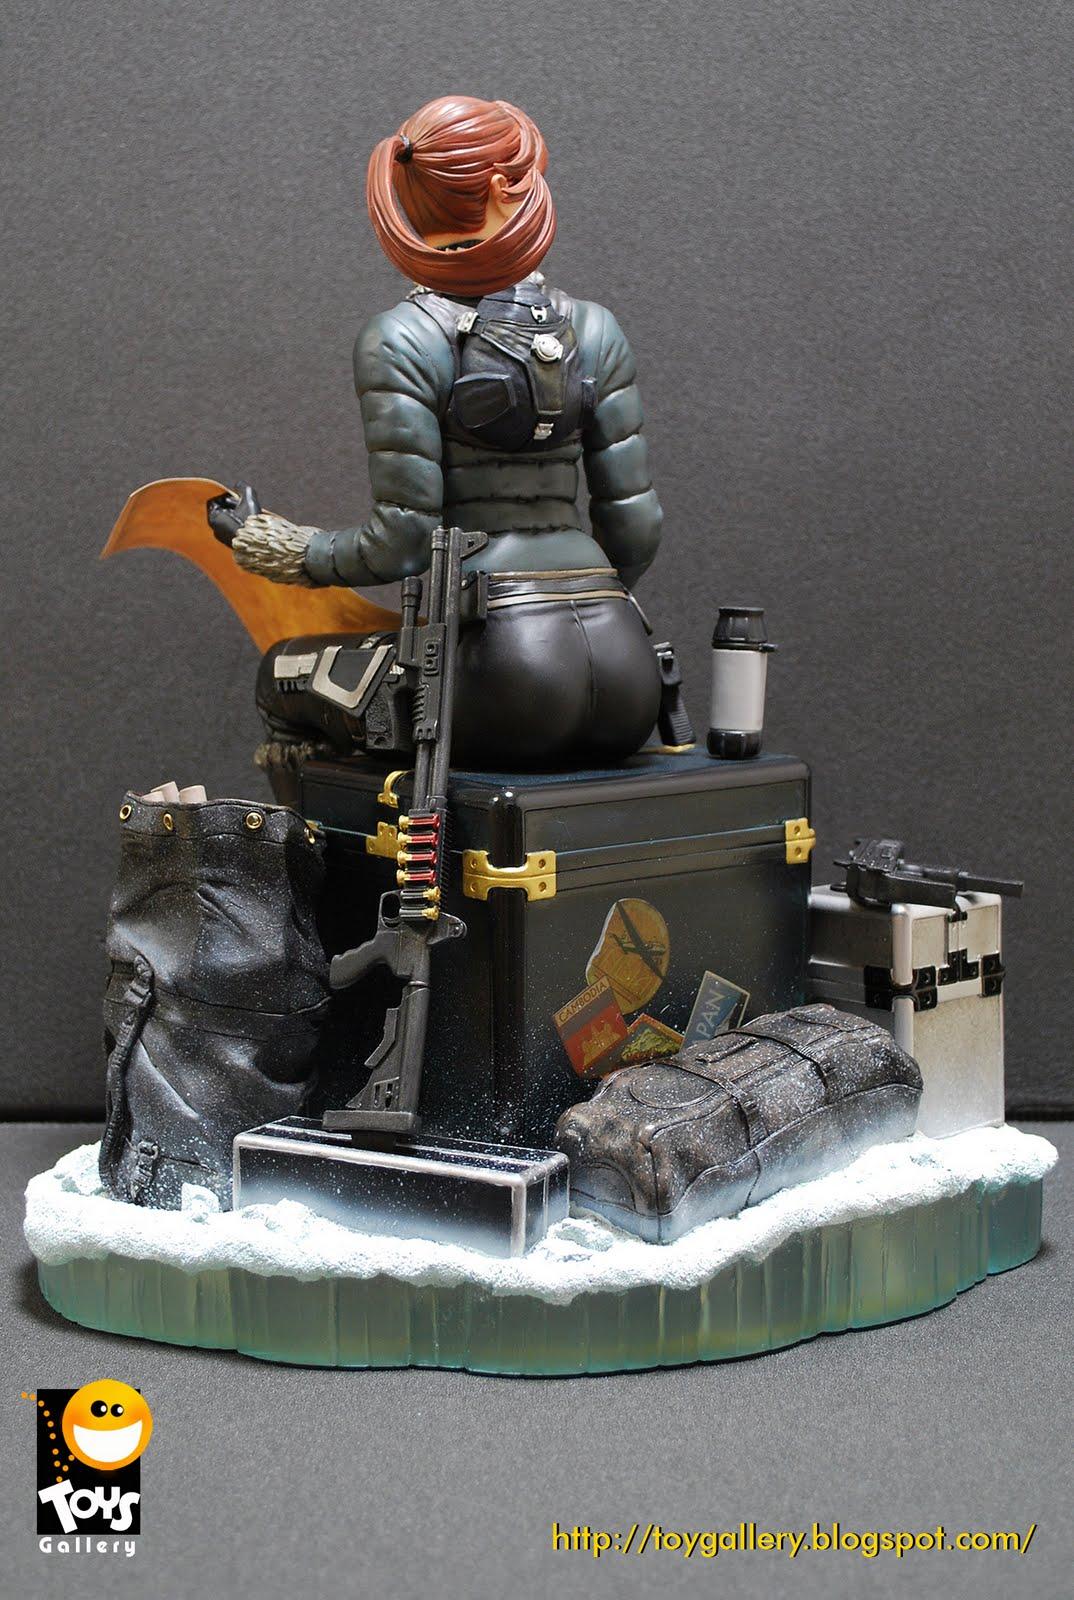 Lara Croft Tomb Raider Toys | Hot Girl HD Wallpaper